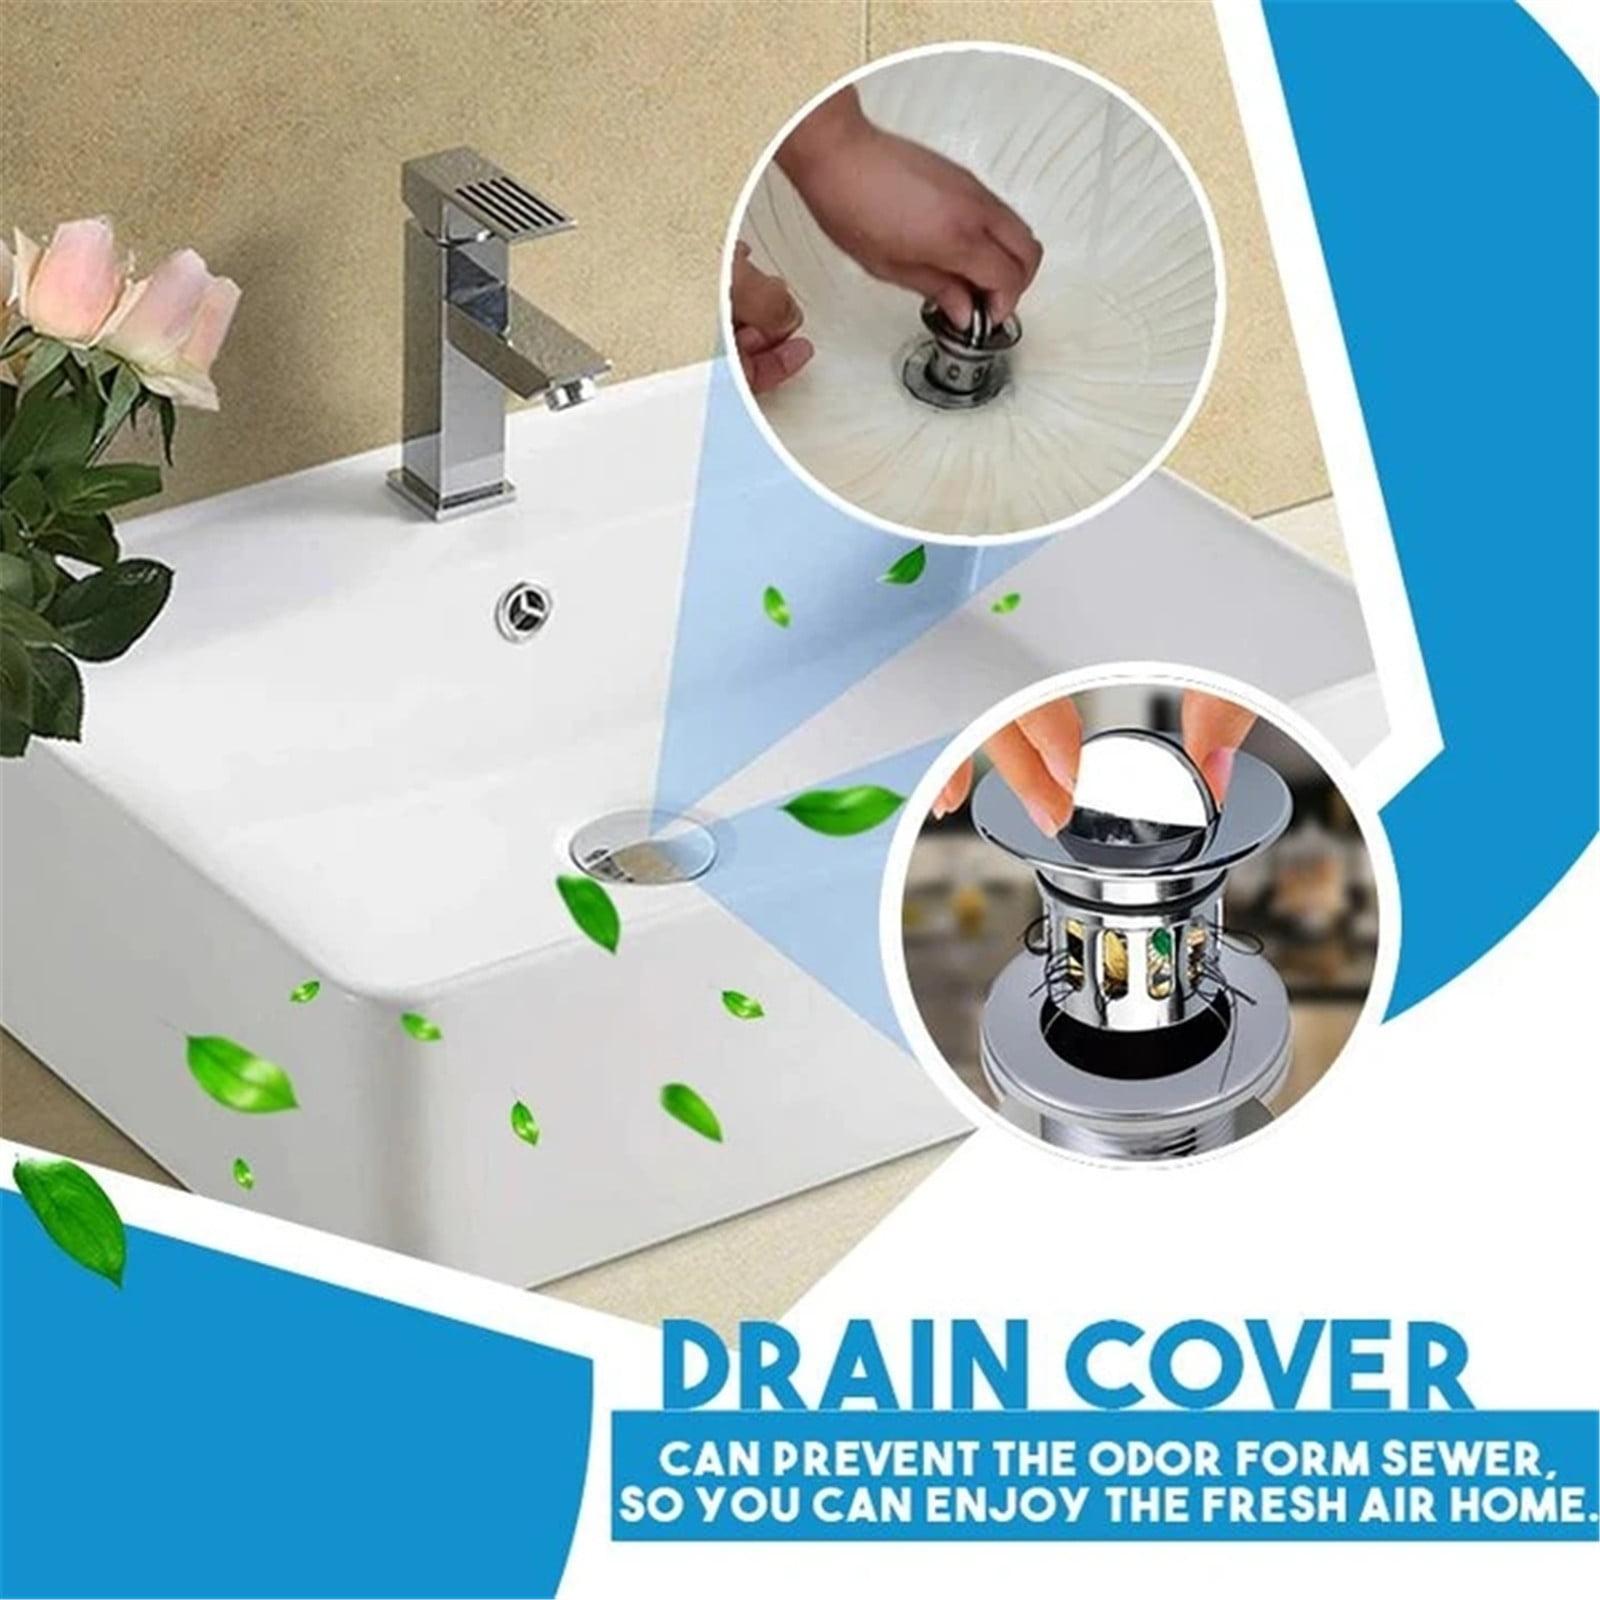 1xUniversal Wash Basin Bounce Drainer Filter Anti-Clogging Bathroom Sink Drainer